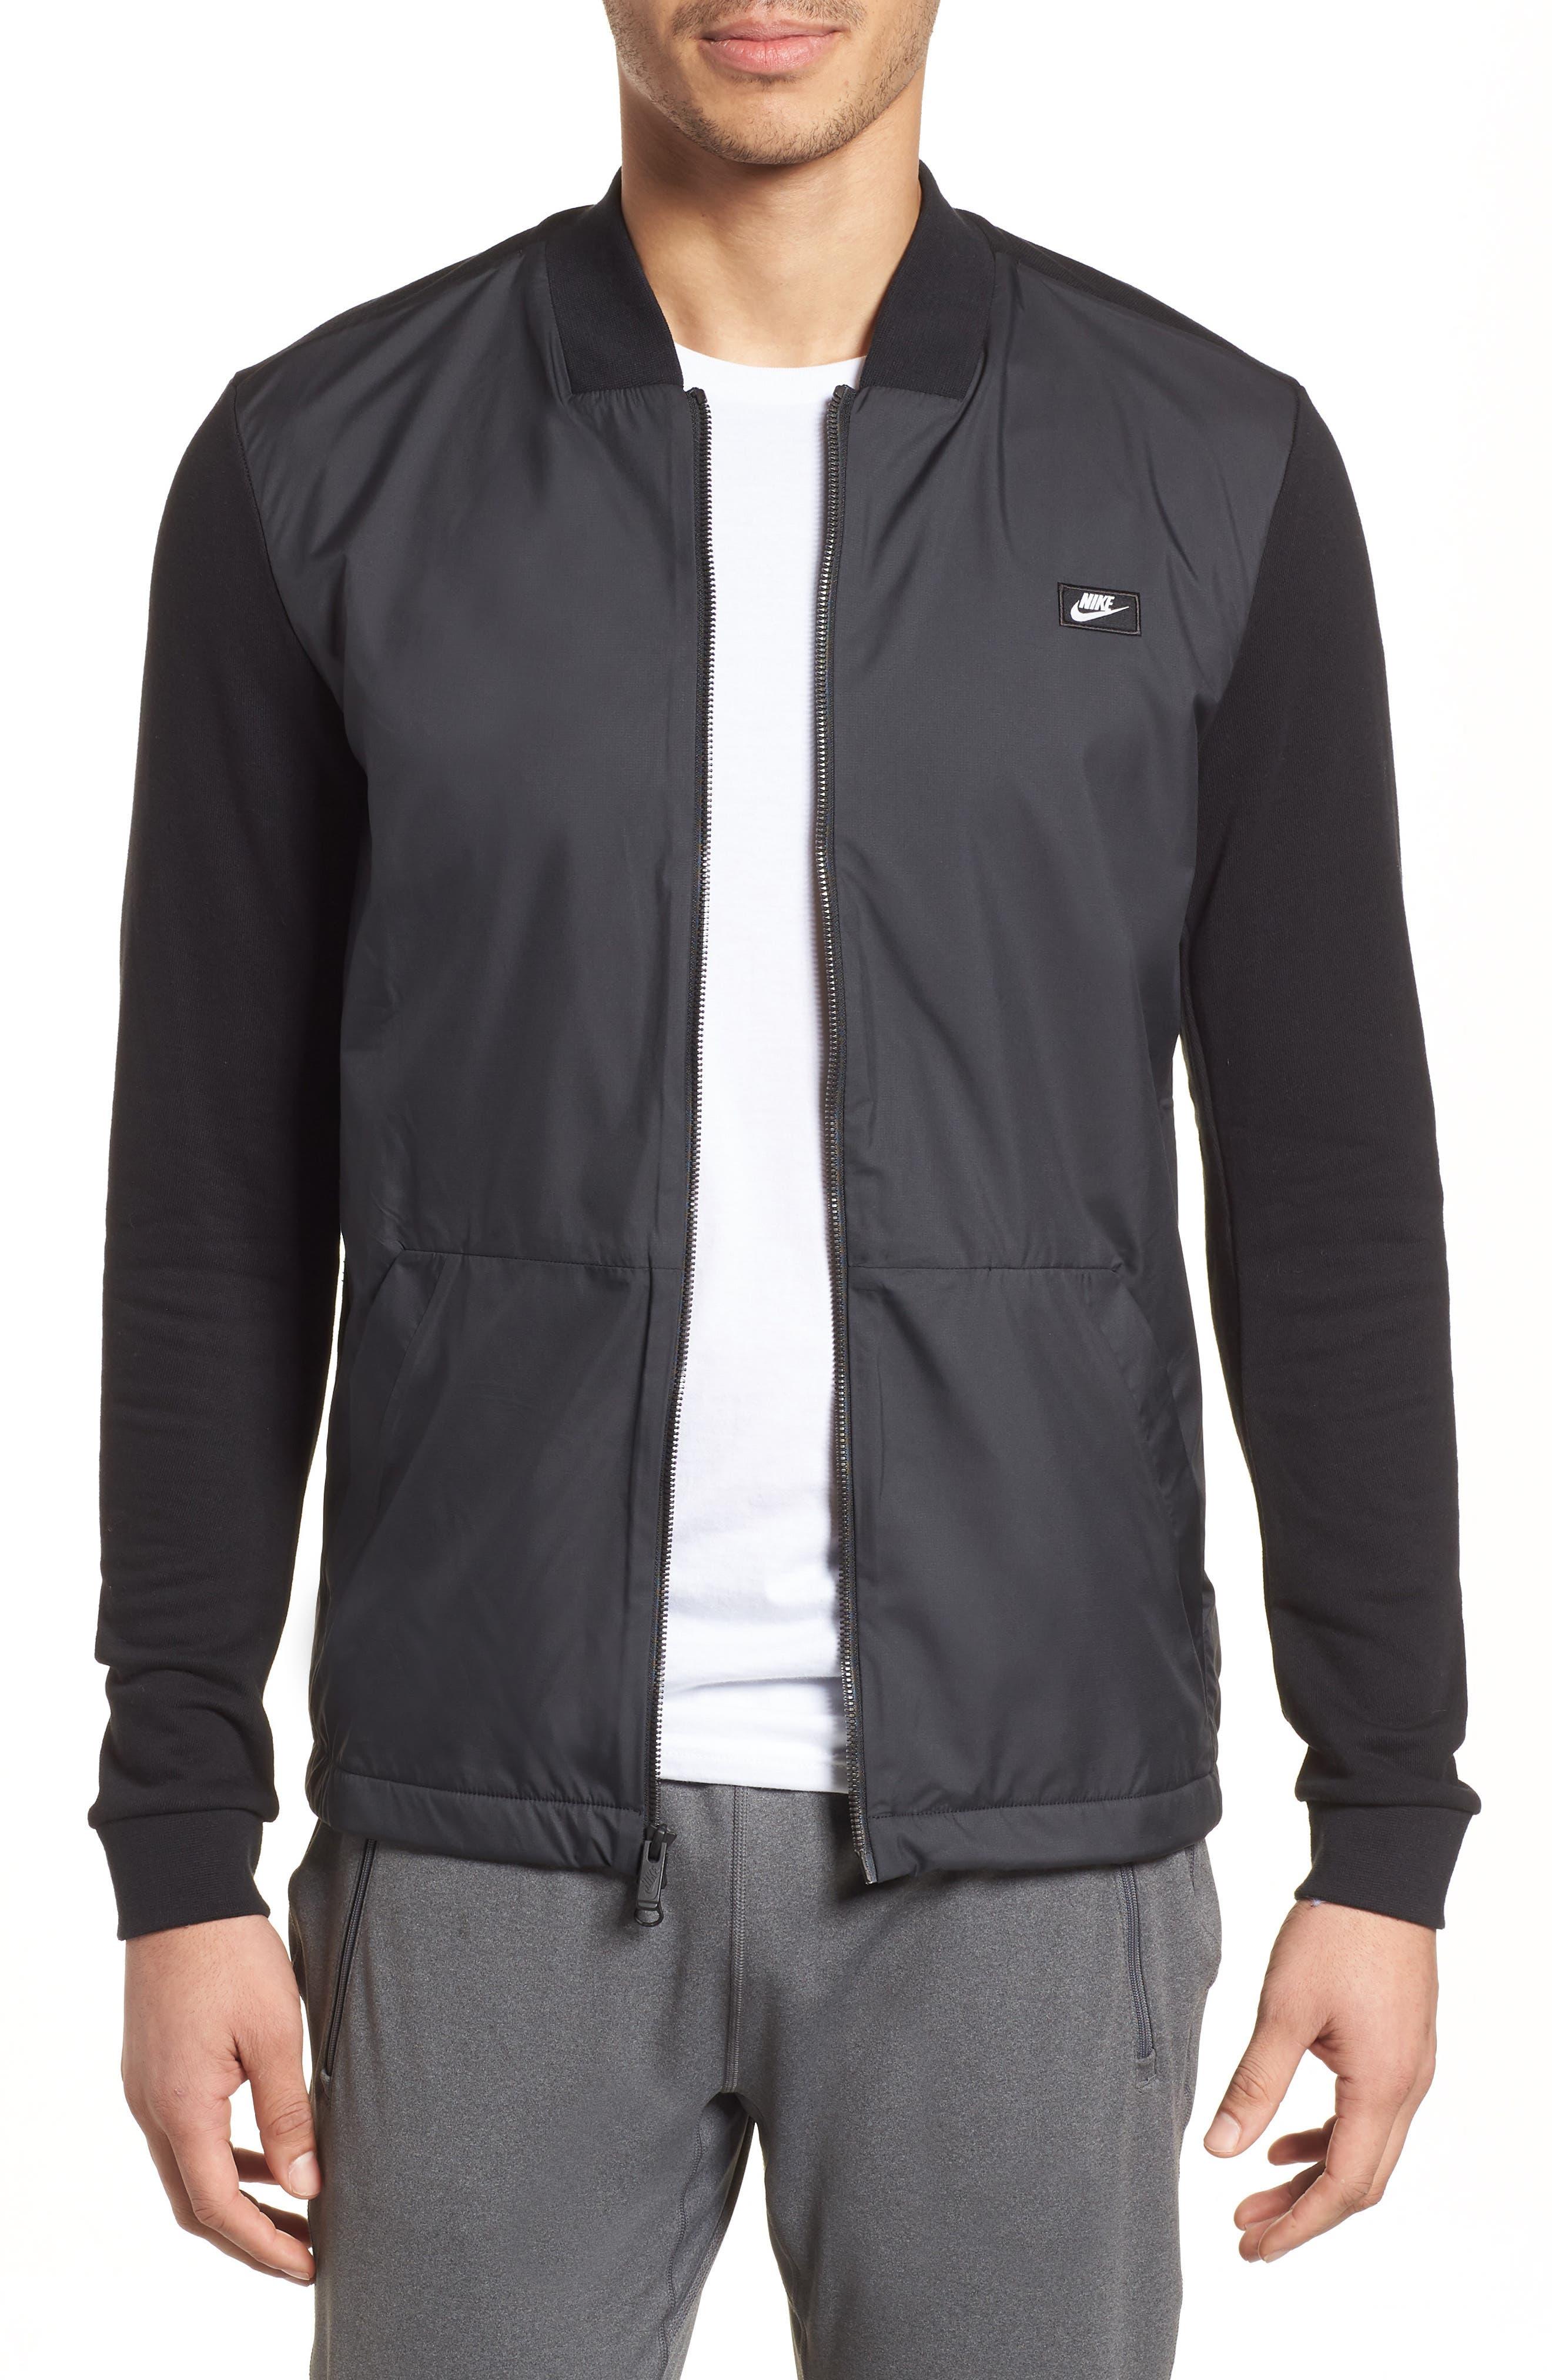 NSW Modern Track Jacket,                             Main thumbnail 1, color,                             Black/ Black